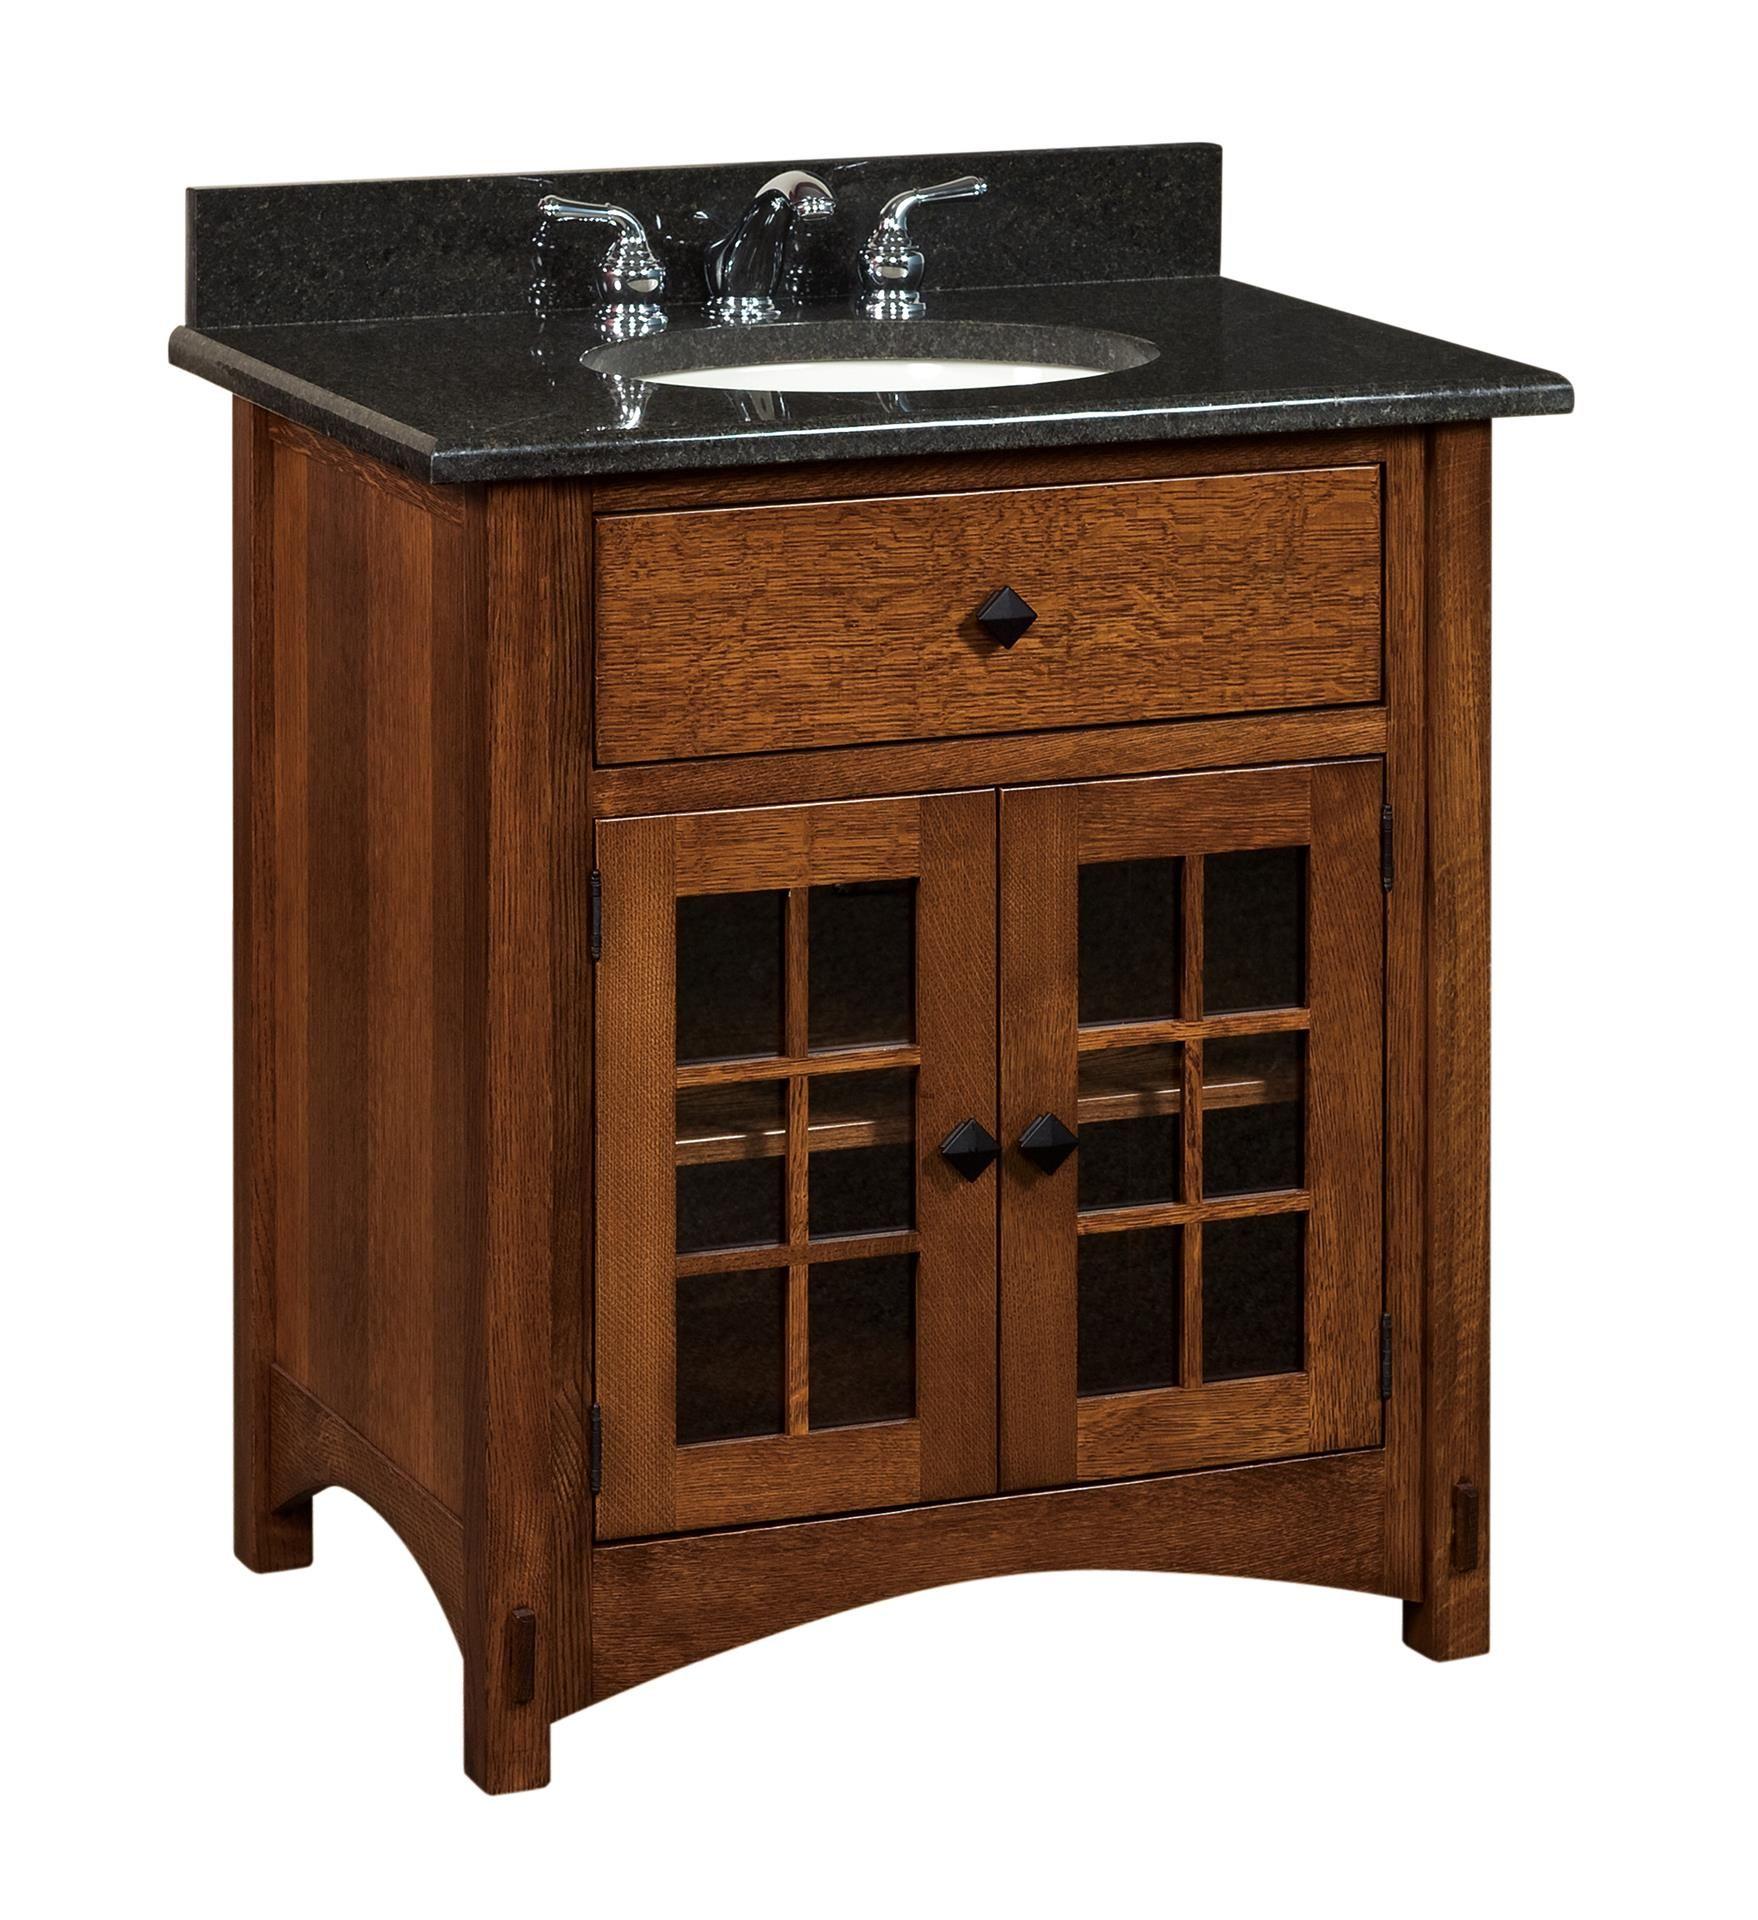 Amish Bathroom Vanity Solid Wood 33 Lucern Mission Sink Console